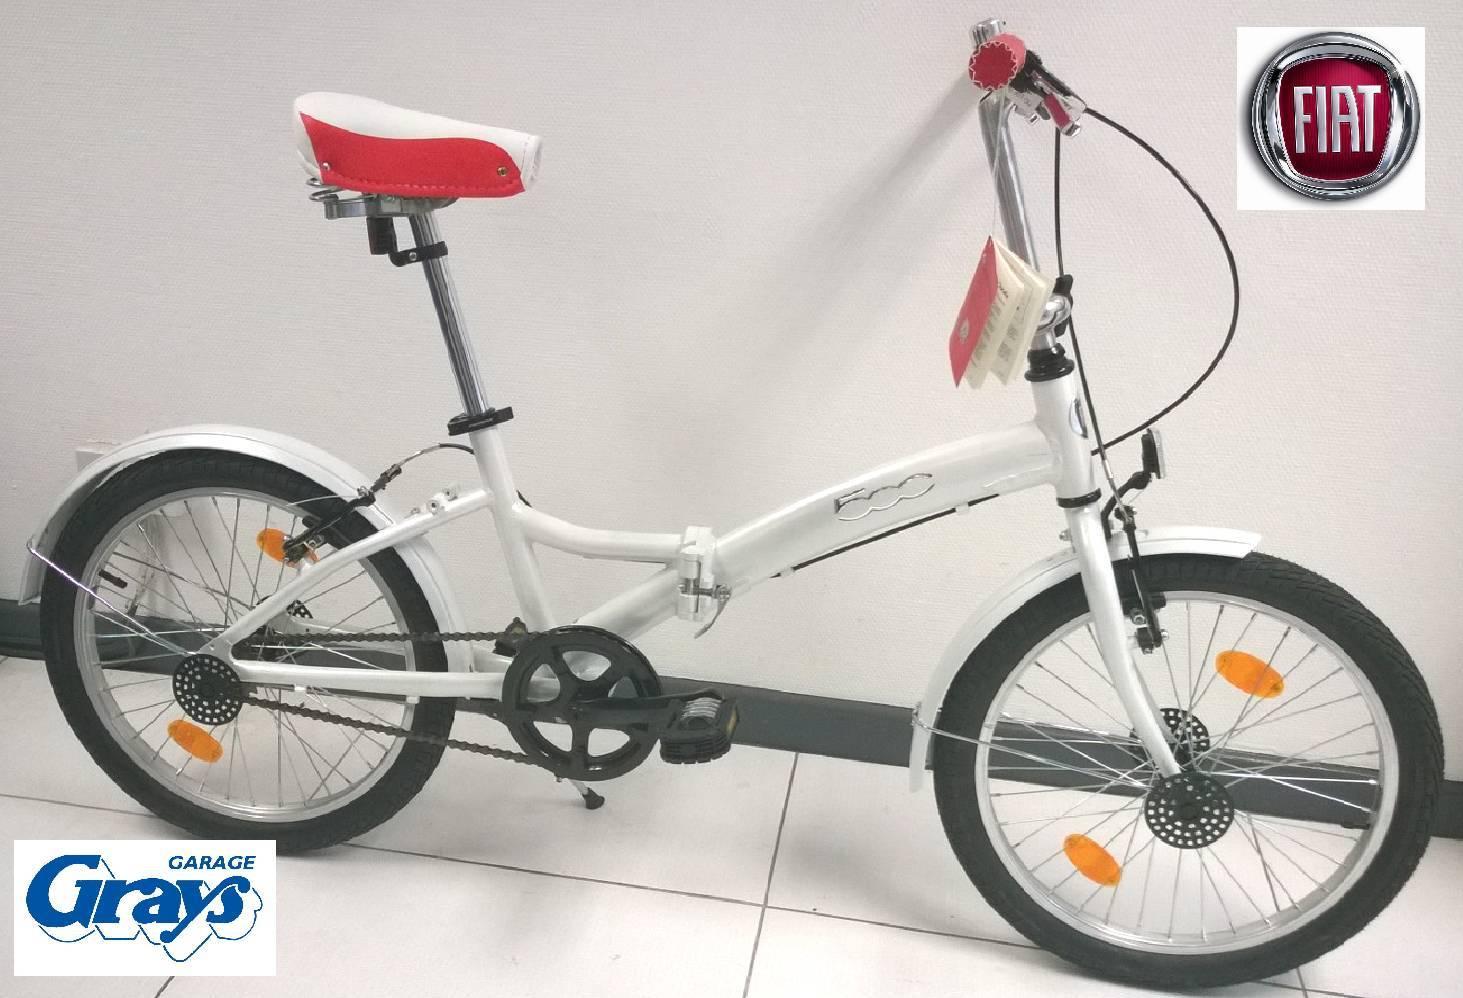 Fiat 500 Bike Fiat 500 Folding Bike Fiat 500 Pop Bike